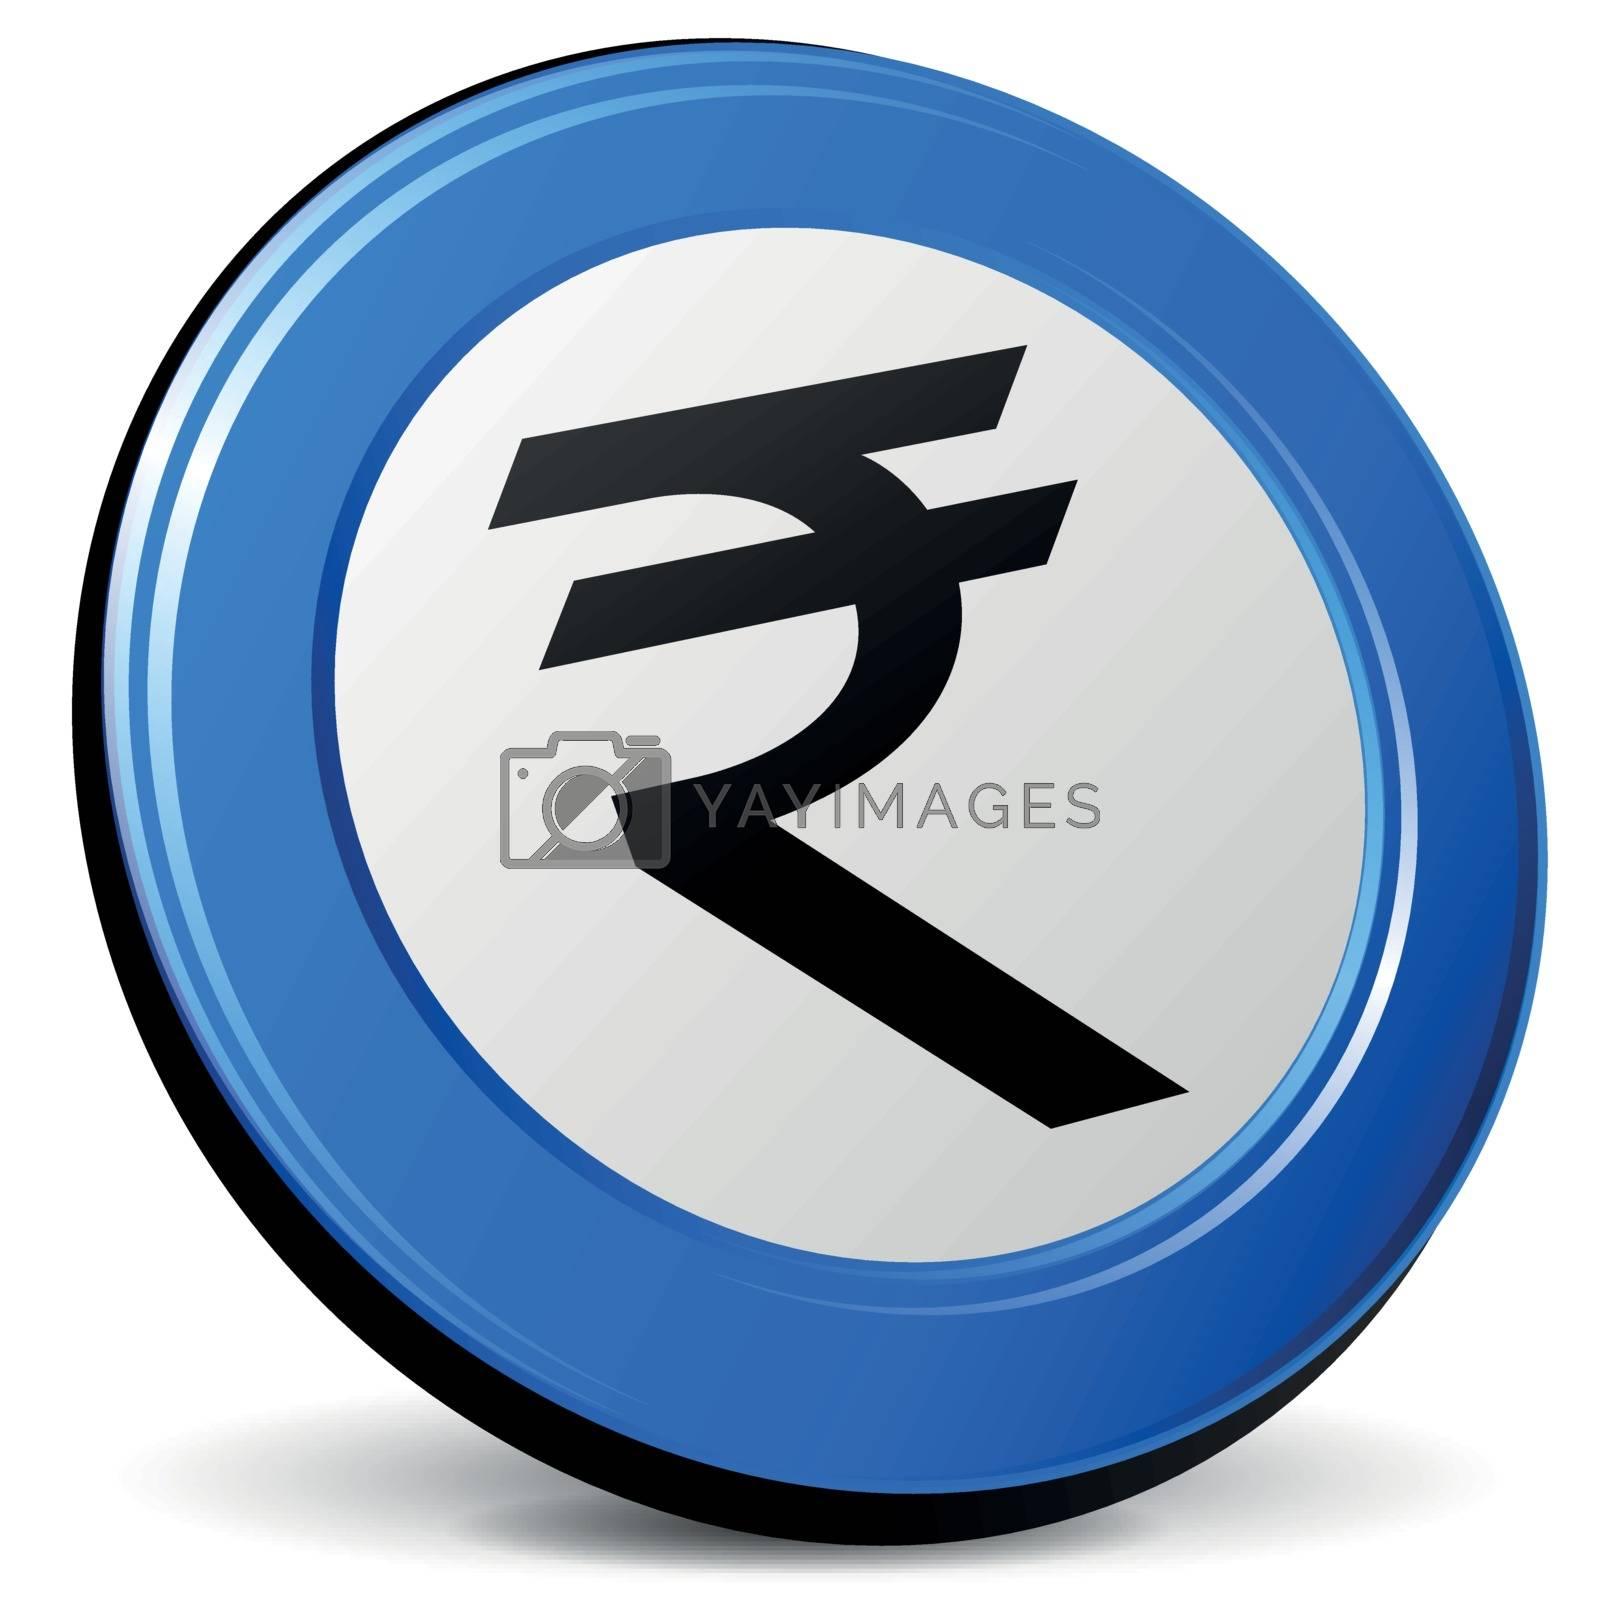 Vector 3d rupee icon by nickylarson974